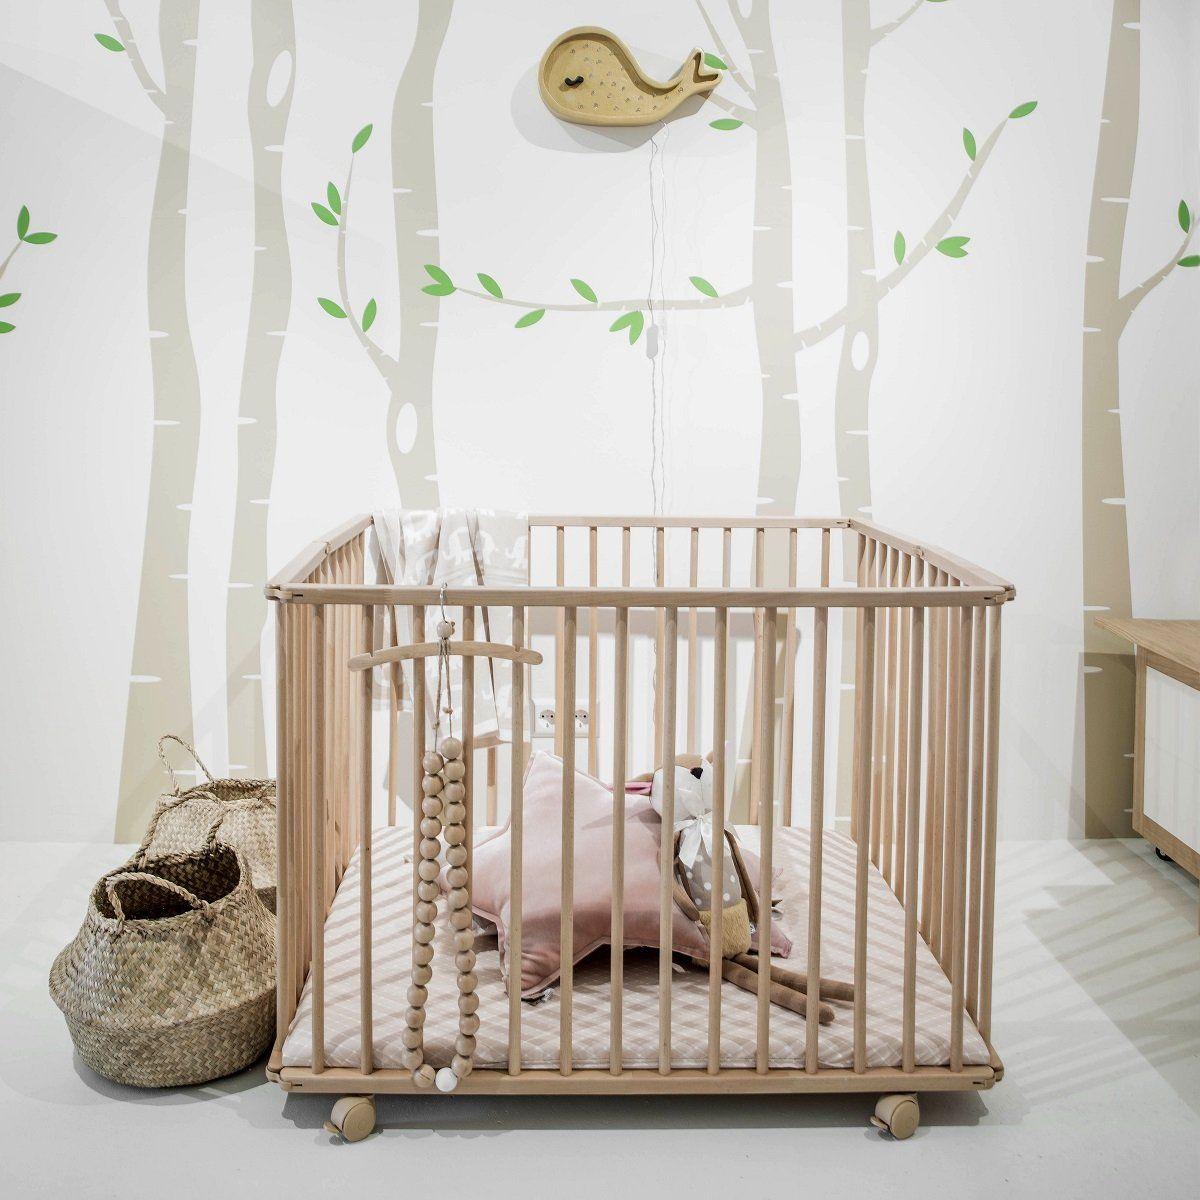 Parc Pour Bebe 76x102cm Tigre Naturel Babykamer Inspiratie Babykamer Babykamer Kopen